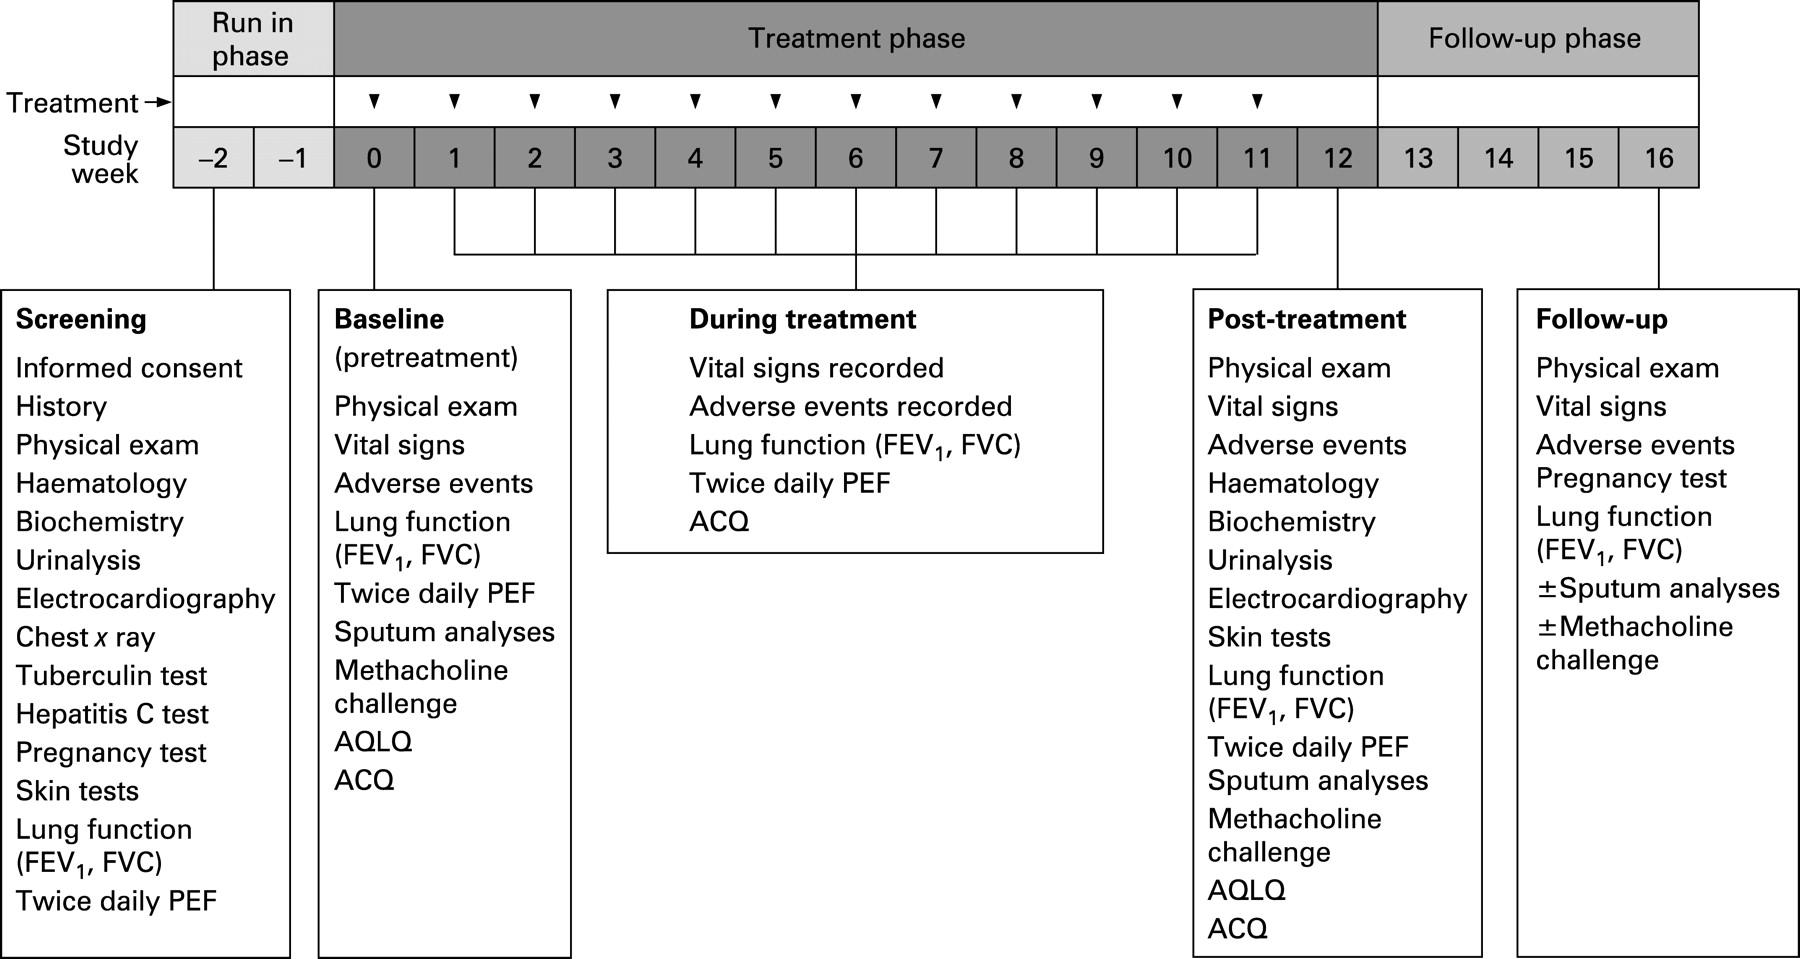 rheumatoid arthritis quality of life questionnaire pdf